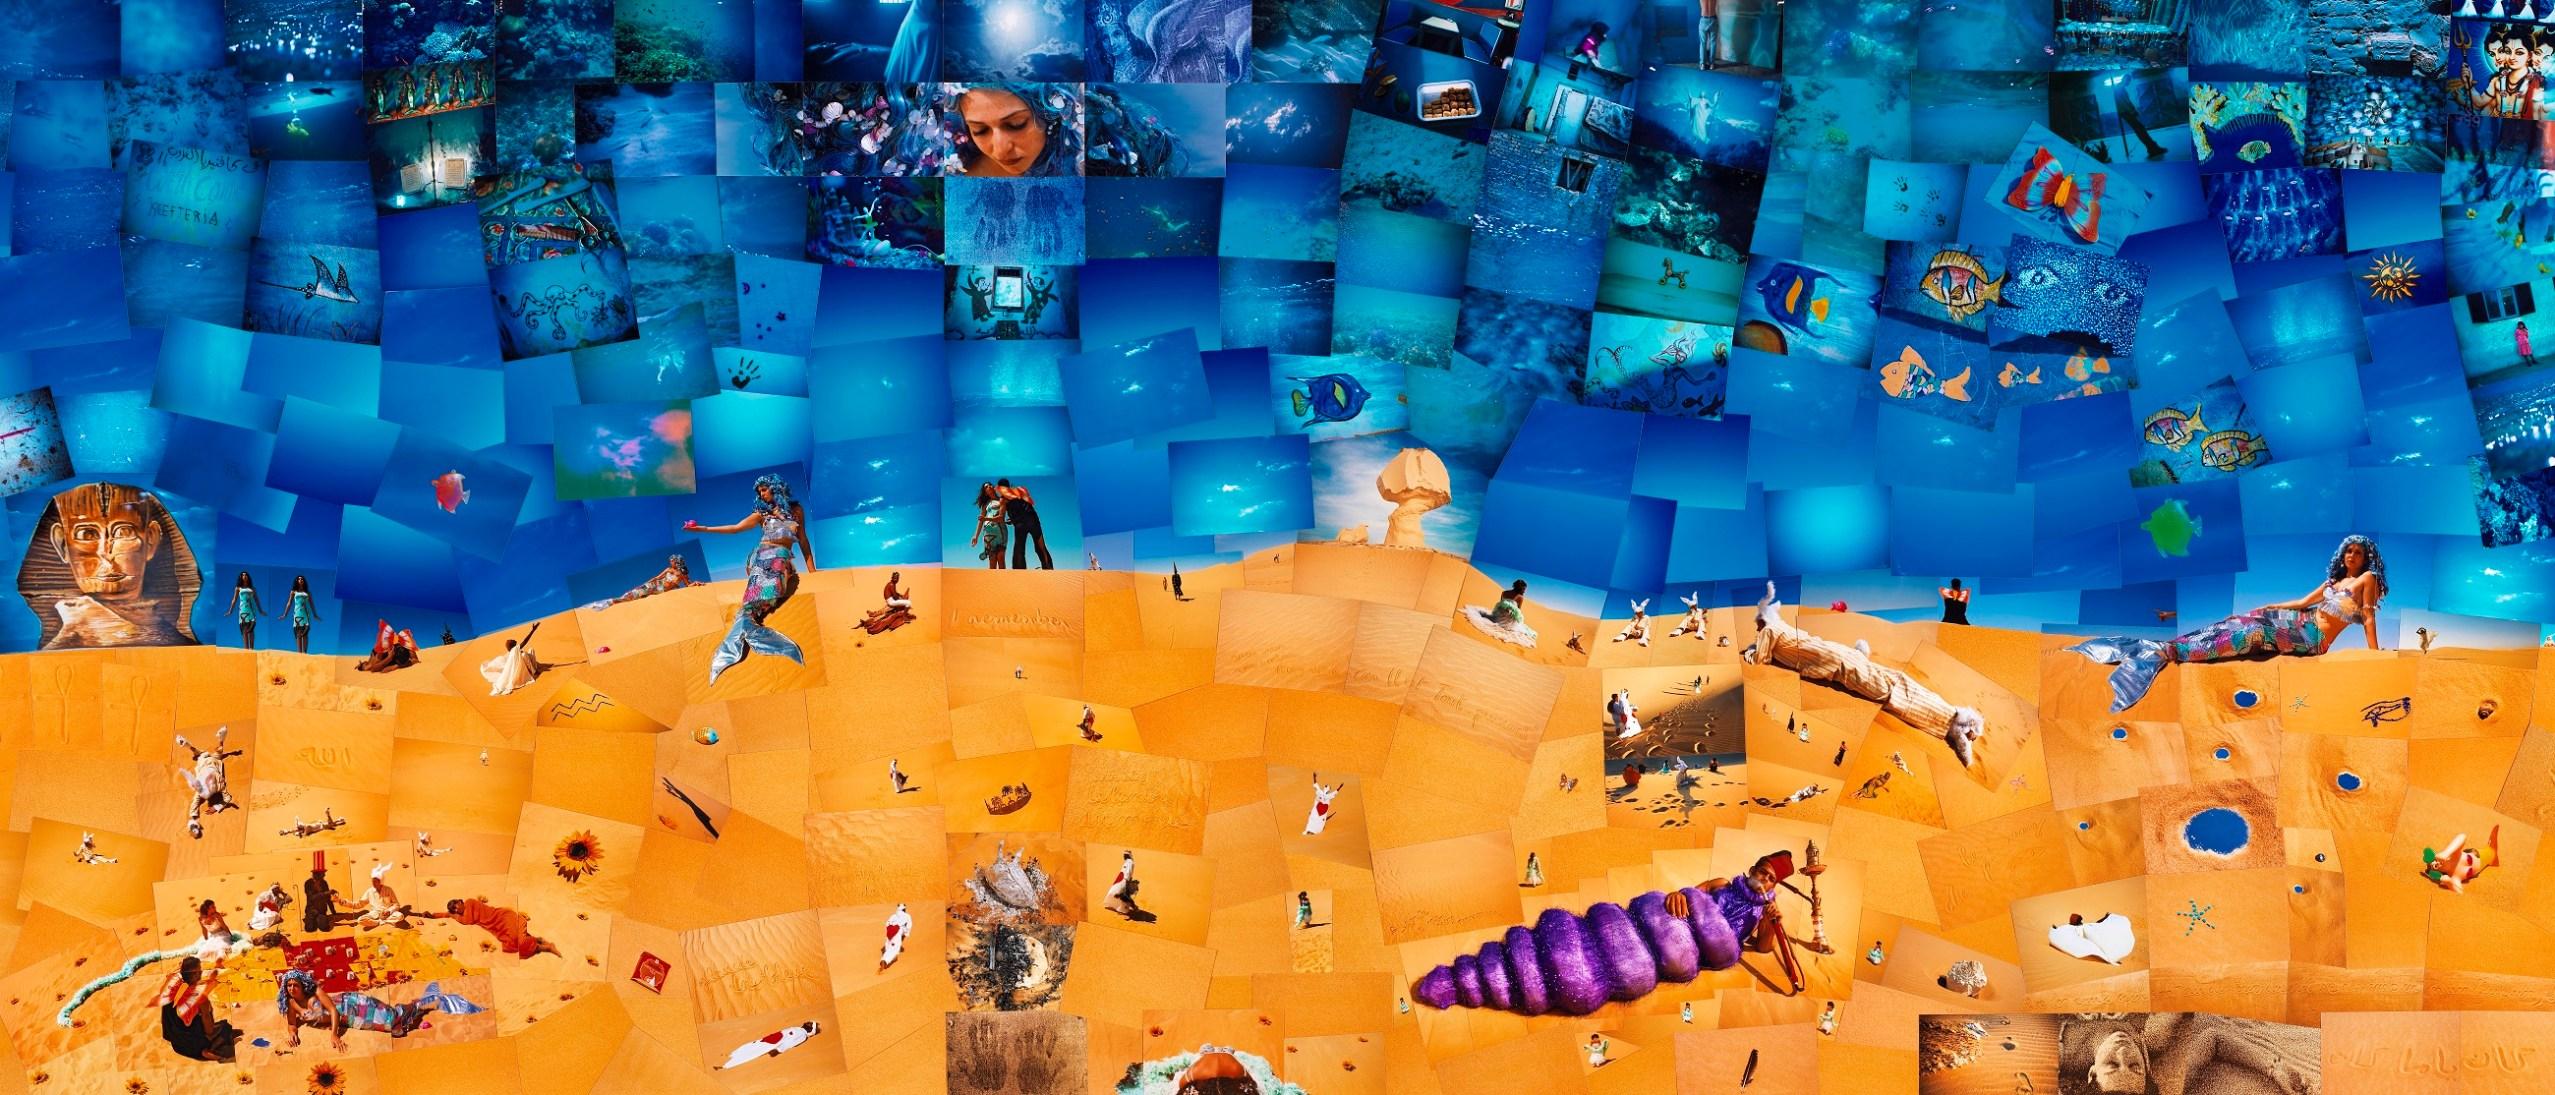 Detail image, Oum el Dounia Lara Baladi (b. 1969, Beirut) Belgium, 2000–2007 Wool and cotton Courtesy of the artist